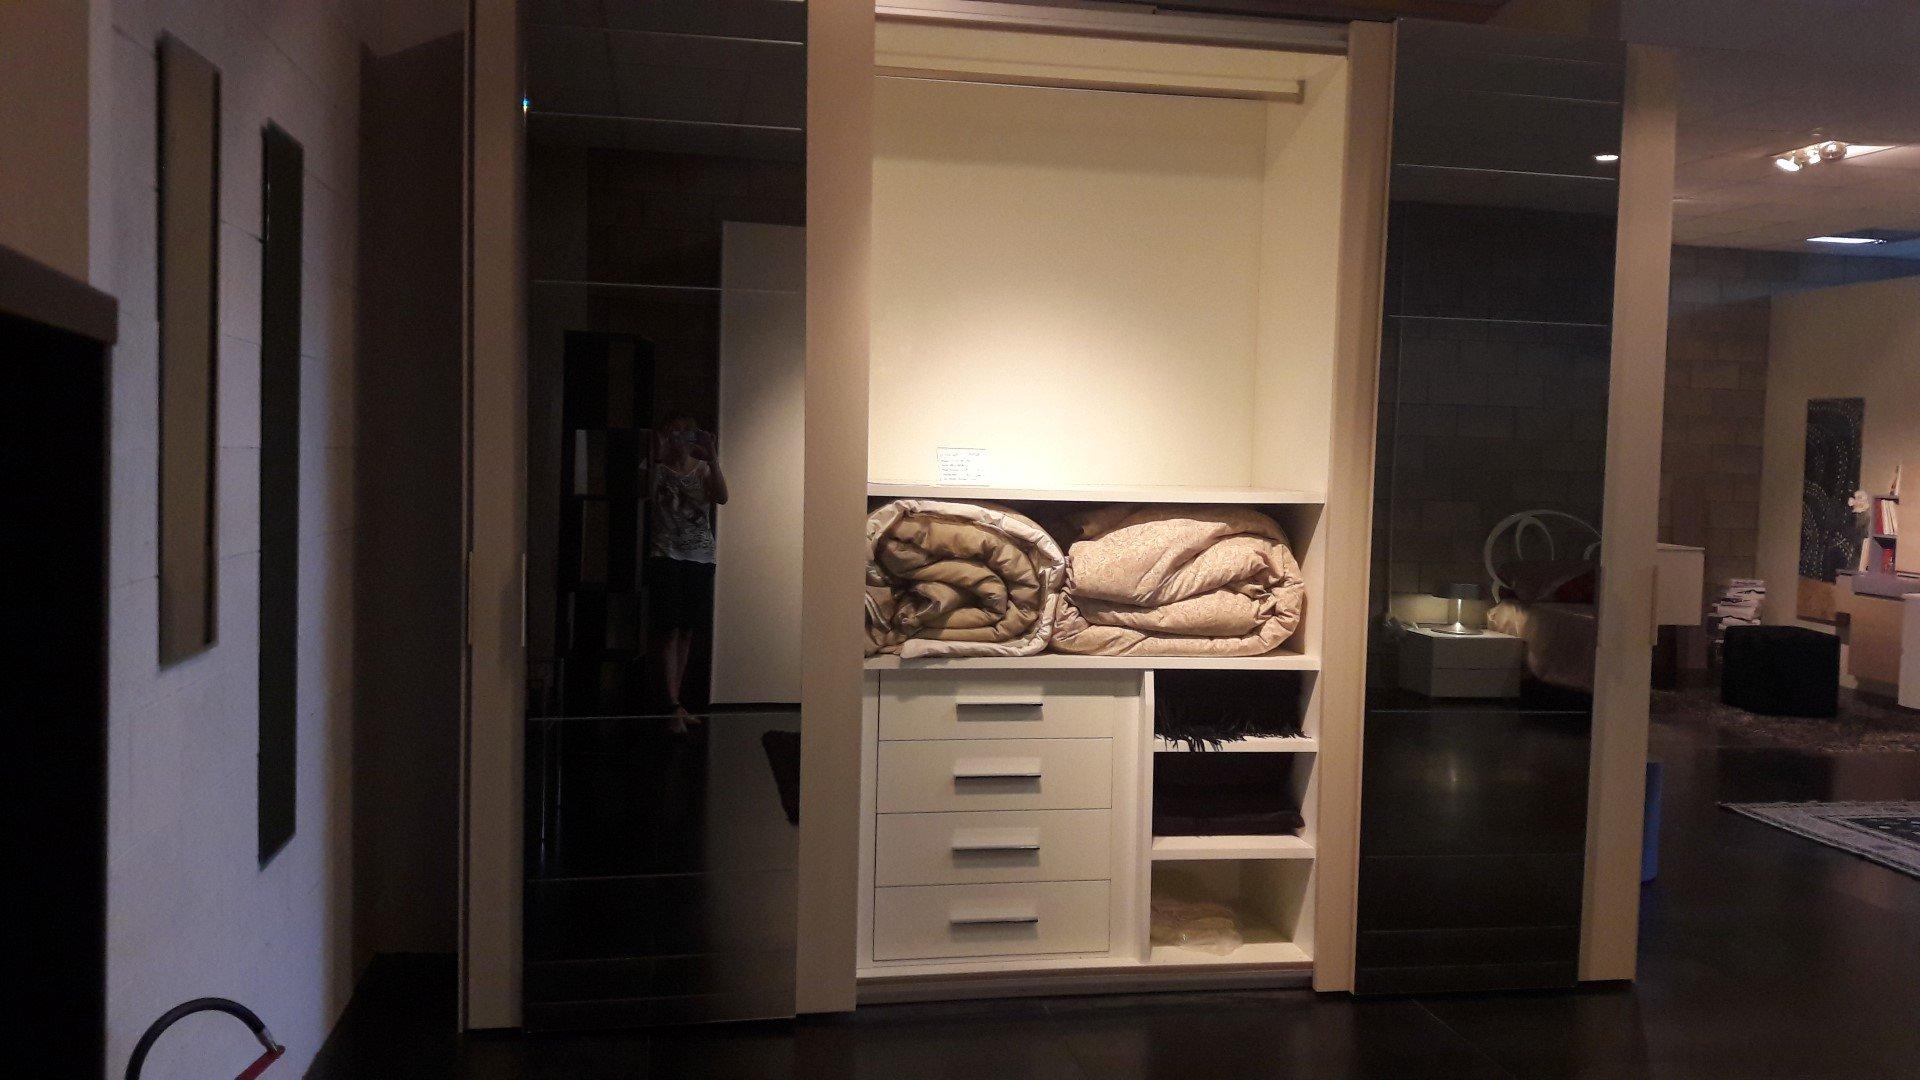 Outlet mobili - Casorate Primo - Pavia - Maroni Casa